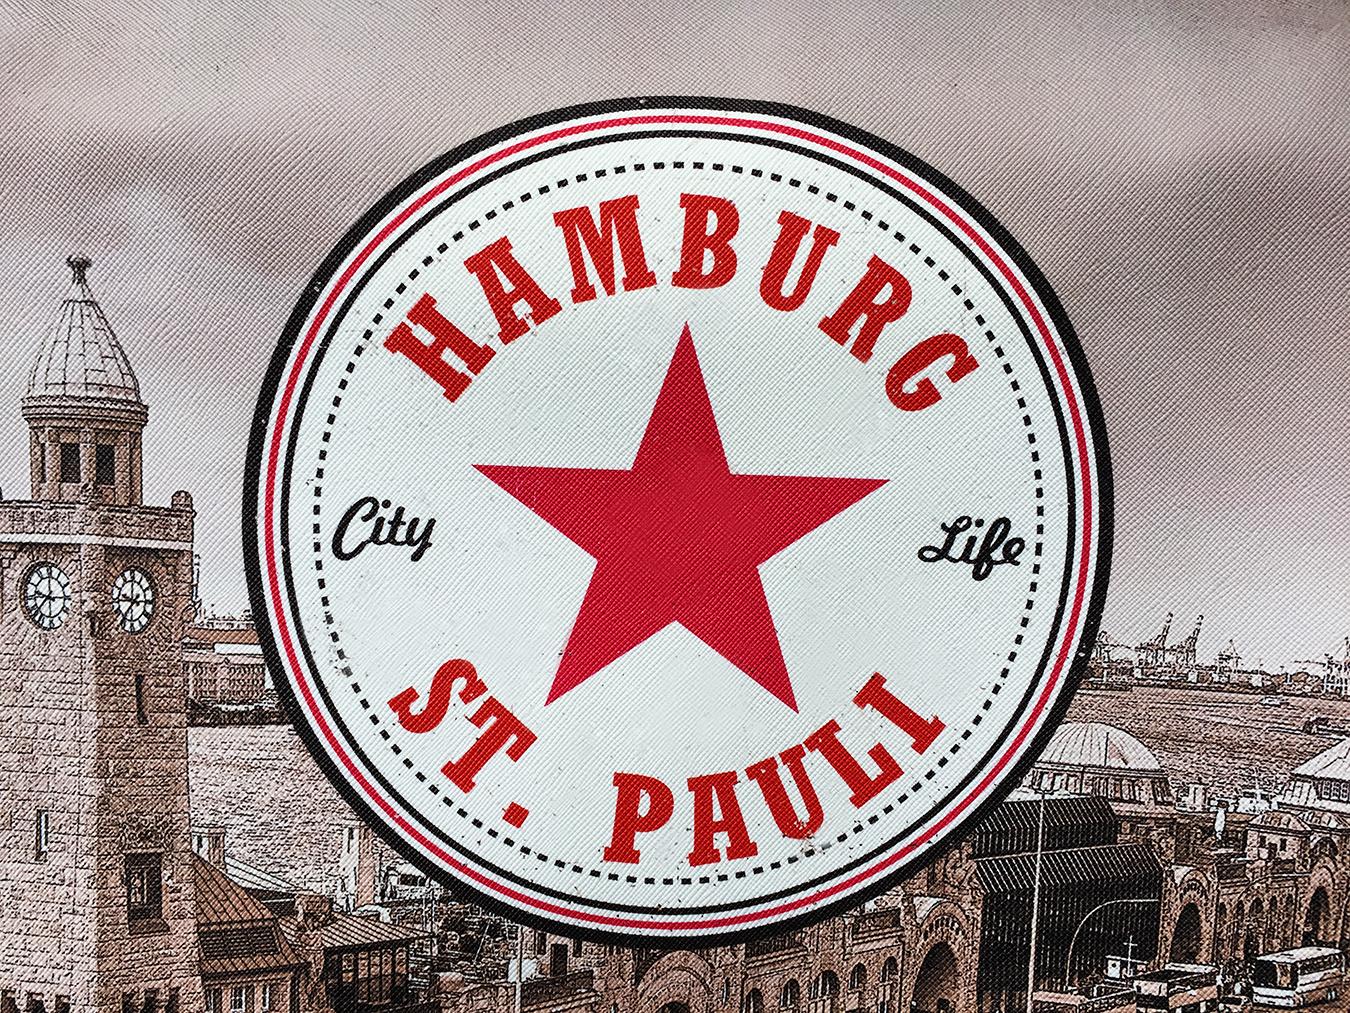 Tony_Ward_photography_travel_pictures_St_Pauli_district_Hamburg_Germany_logo